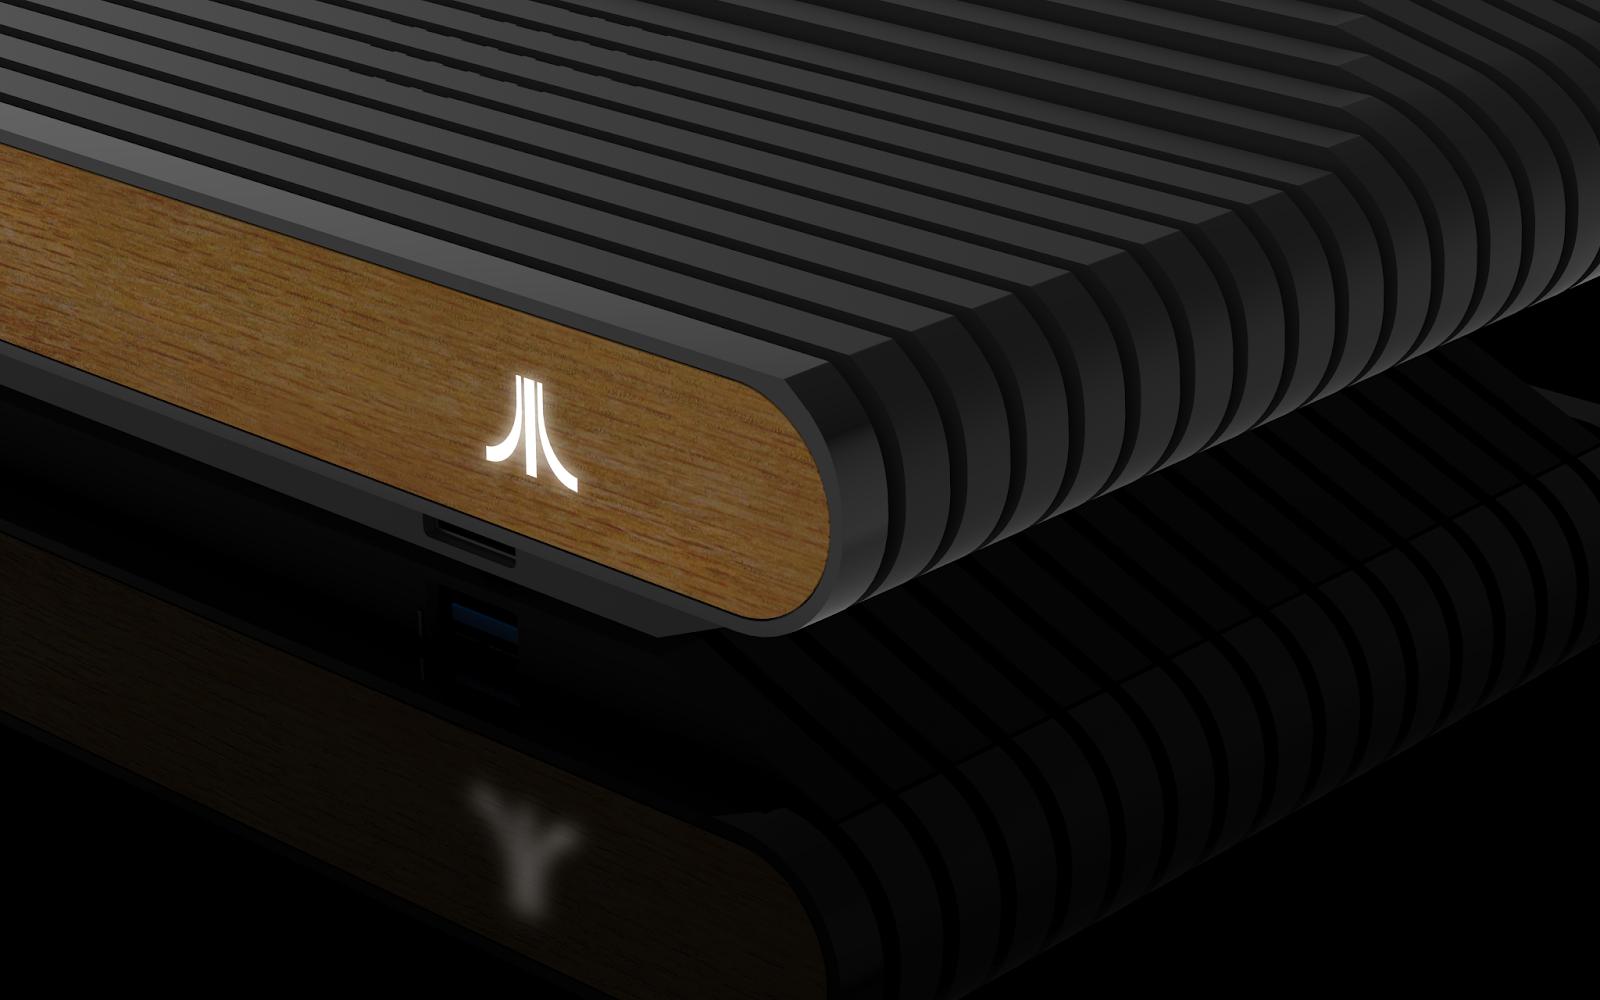 Atari VCS Will Include 100 Atari 2600 And Arcade Classics At Launch